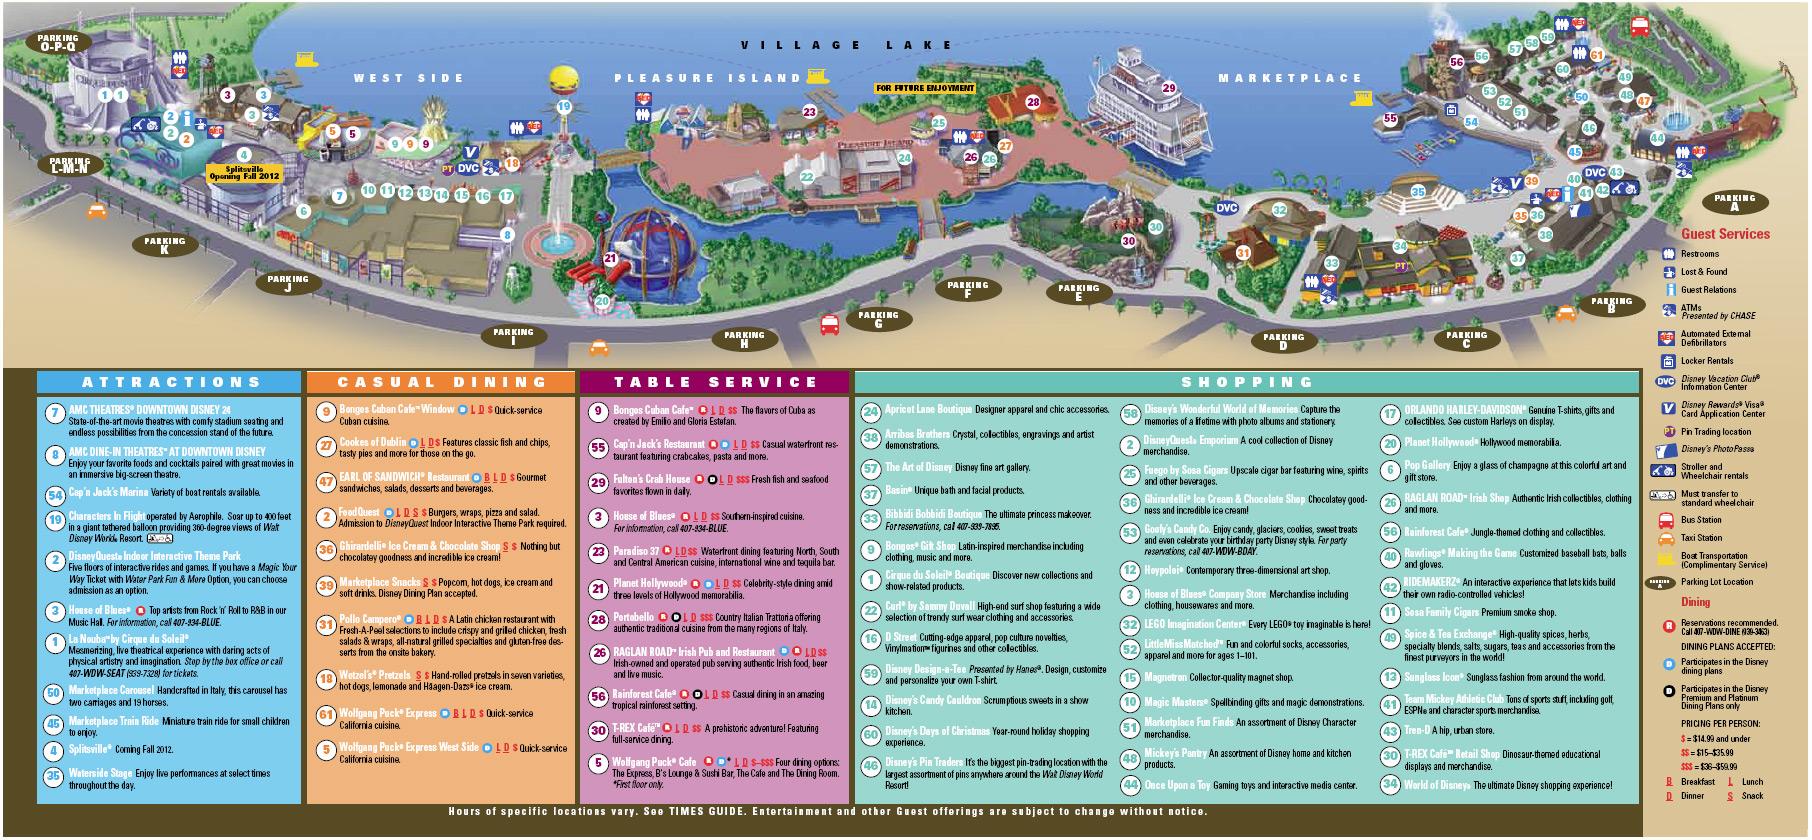 Downtown Disney Map September 2011 1 of 1